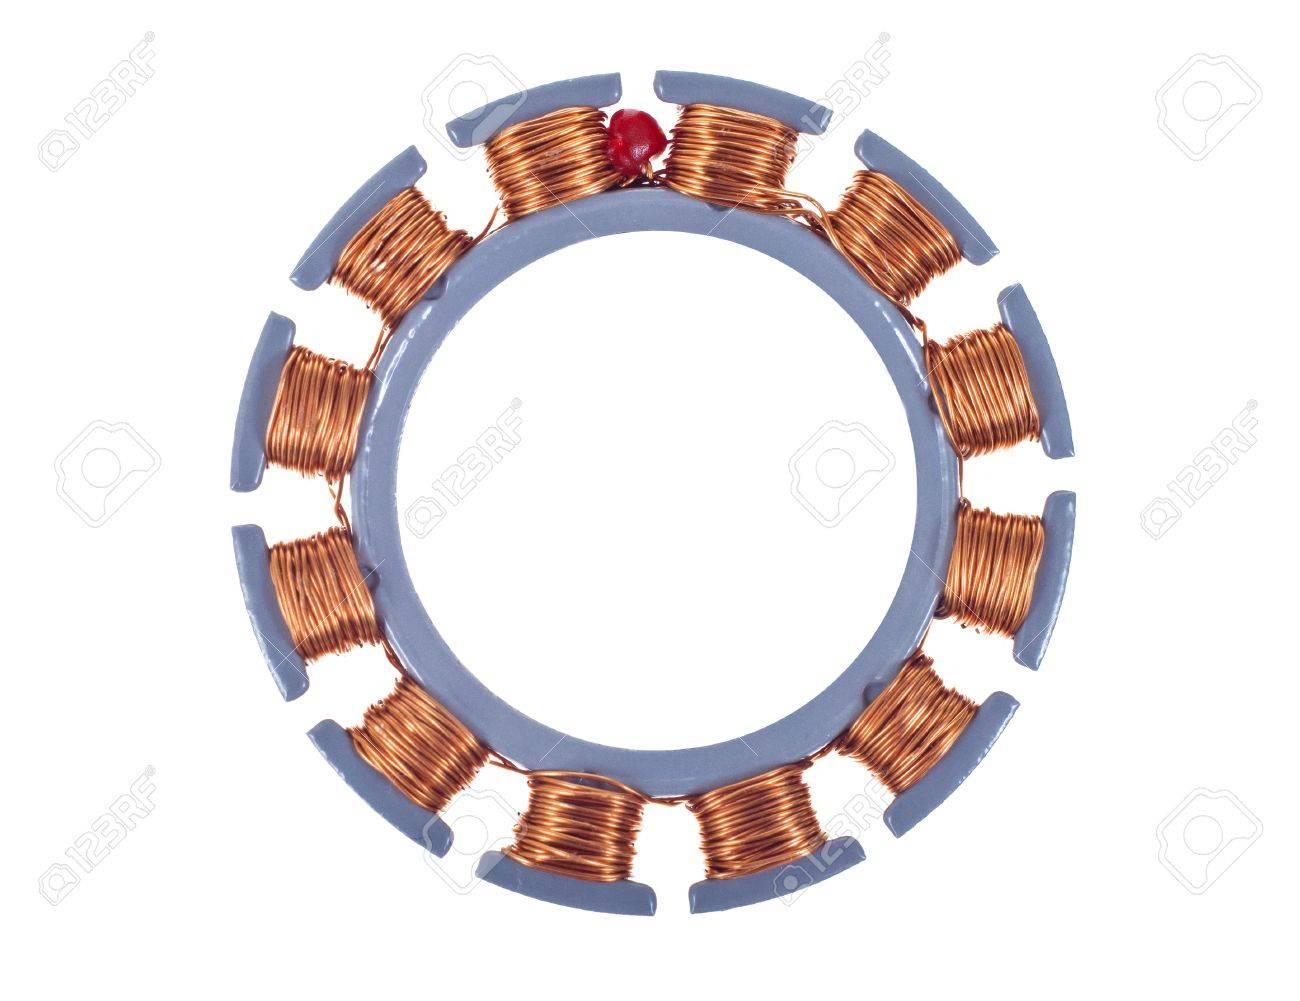 Single Winding Motor - Dolgular.com